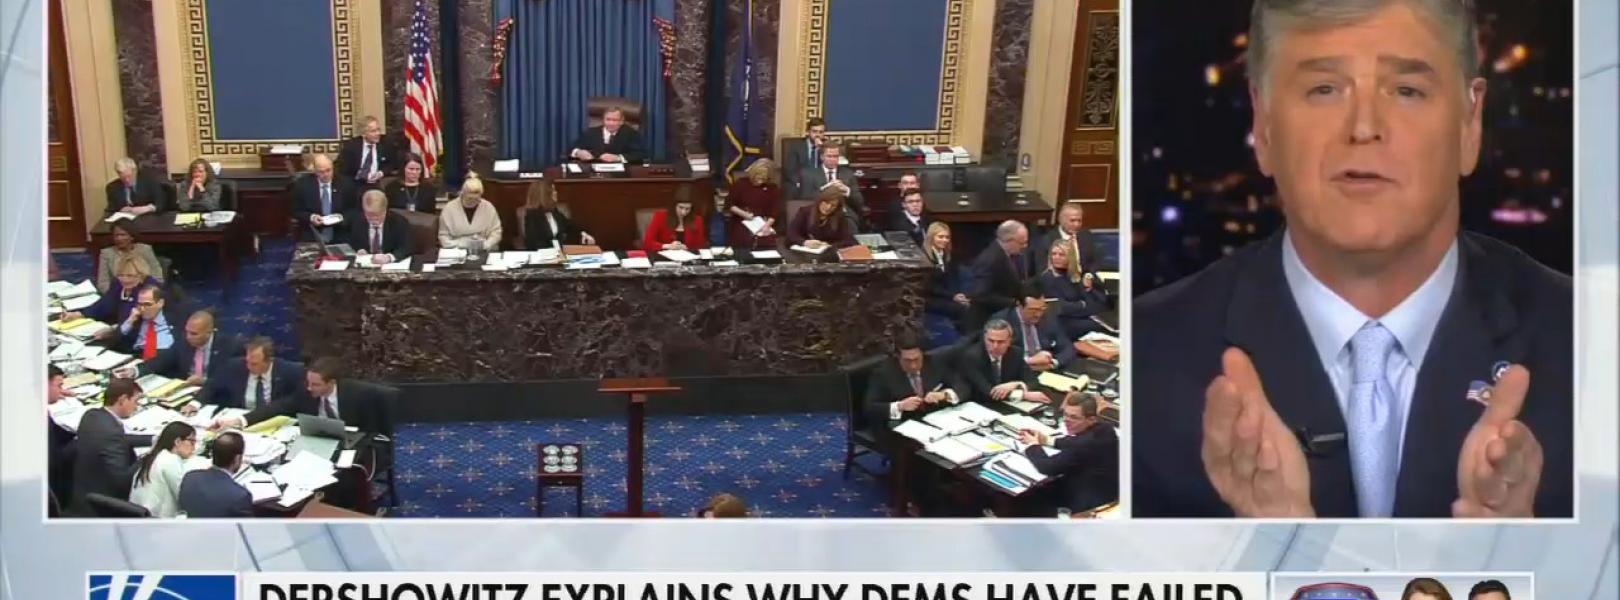 Sean Hannity impeachment trial